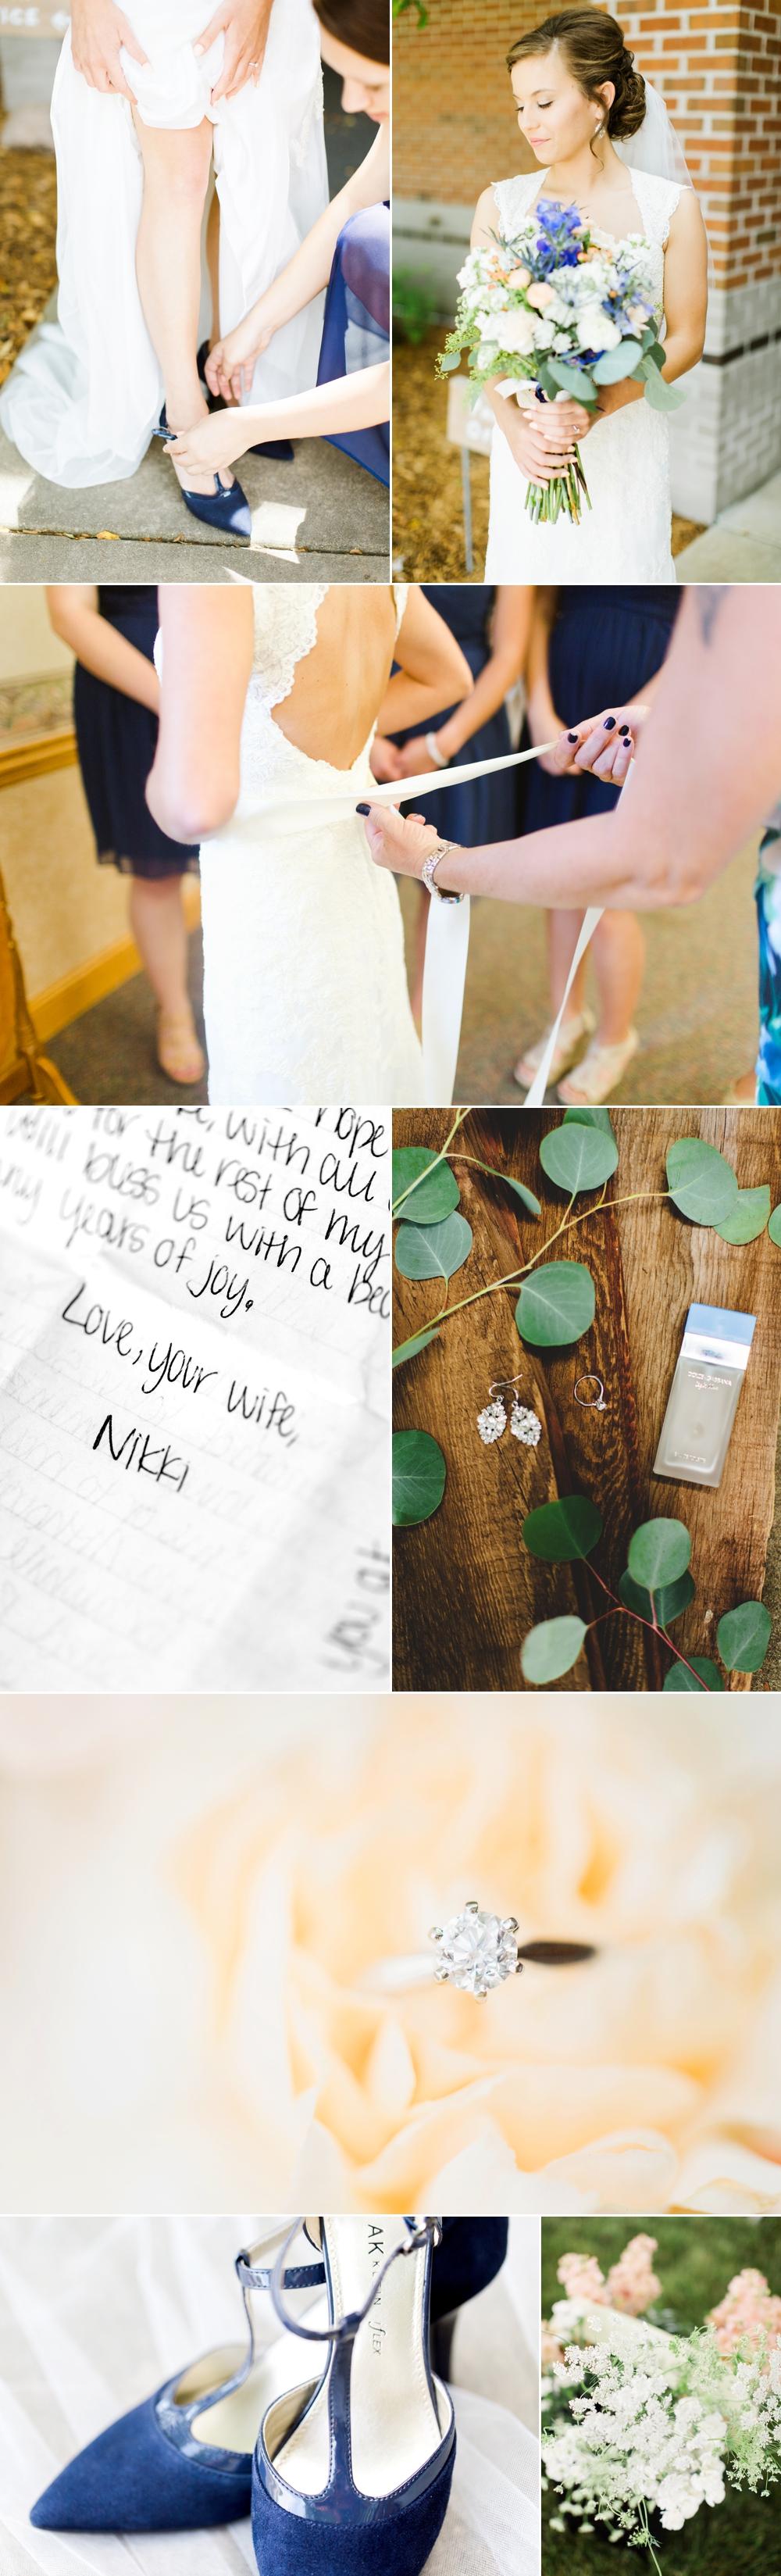 Ely Blog Collage 4.jpg